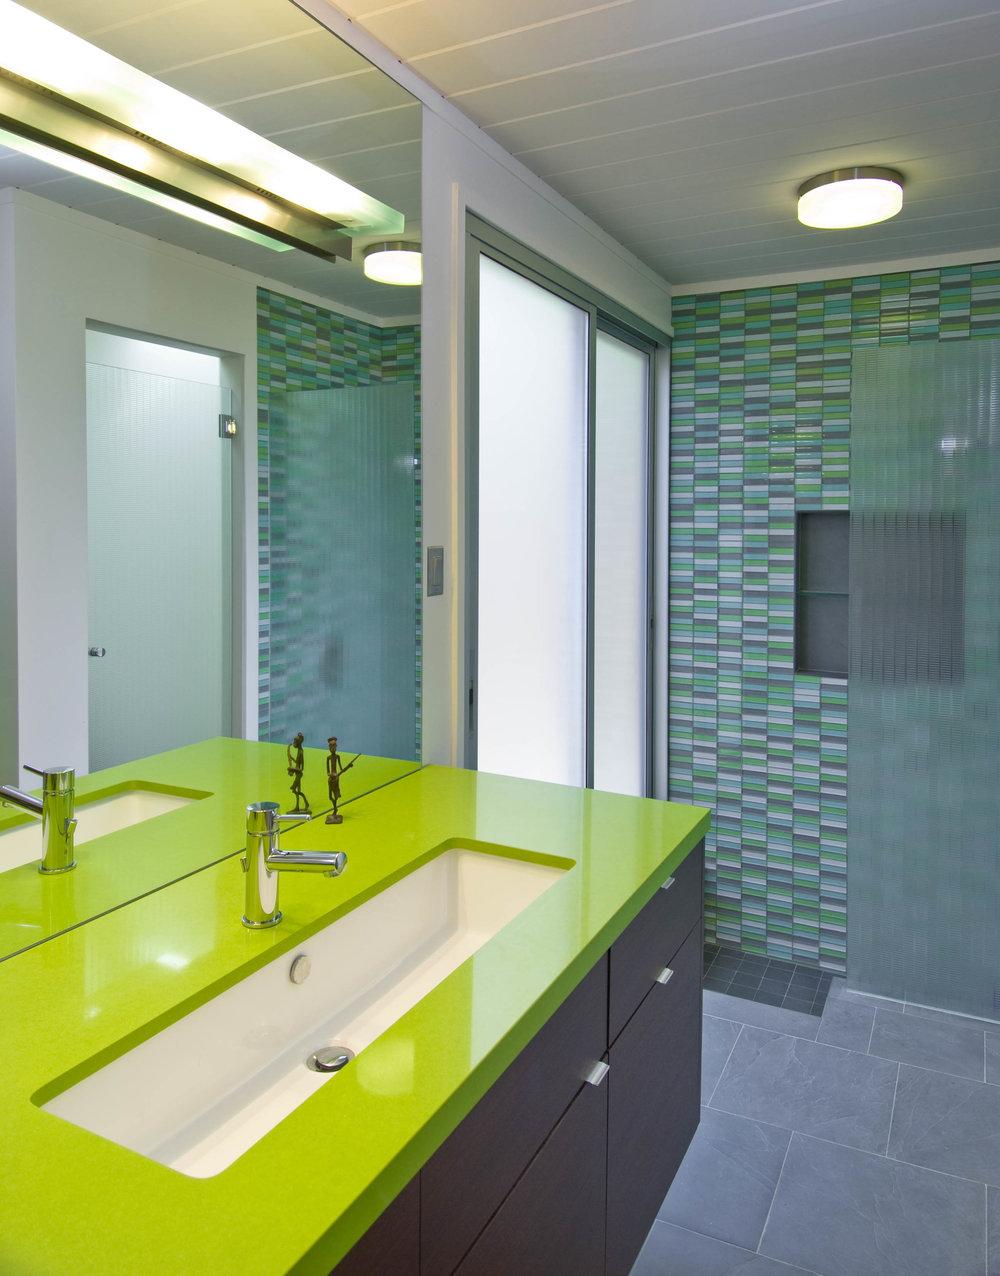 Portfolio — Second Generation Tile and Stone, Inc.